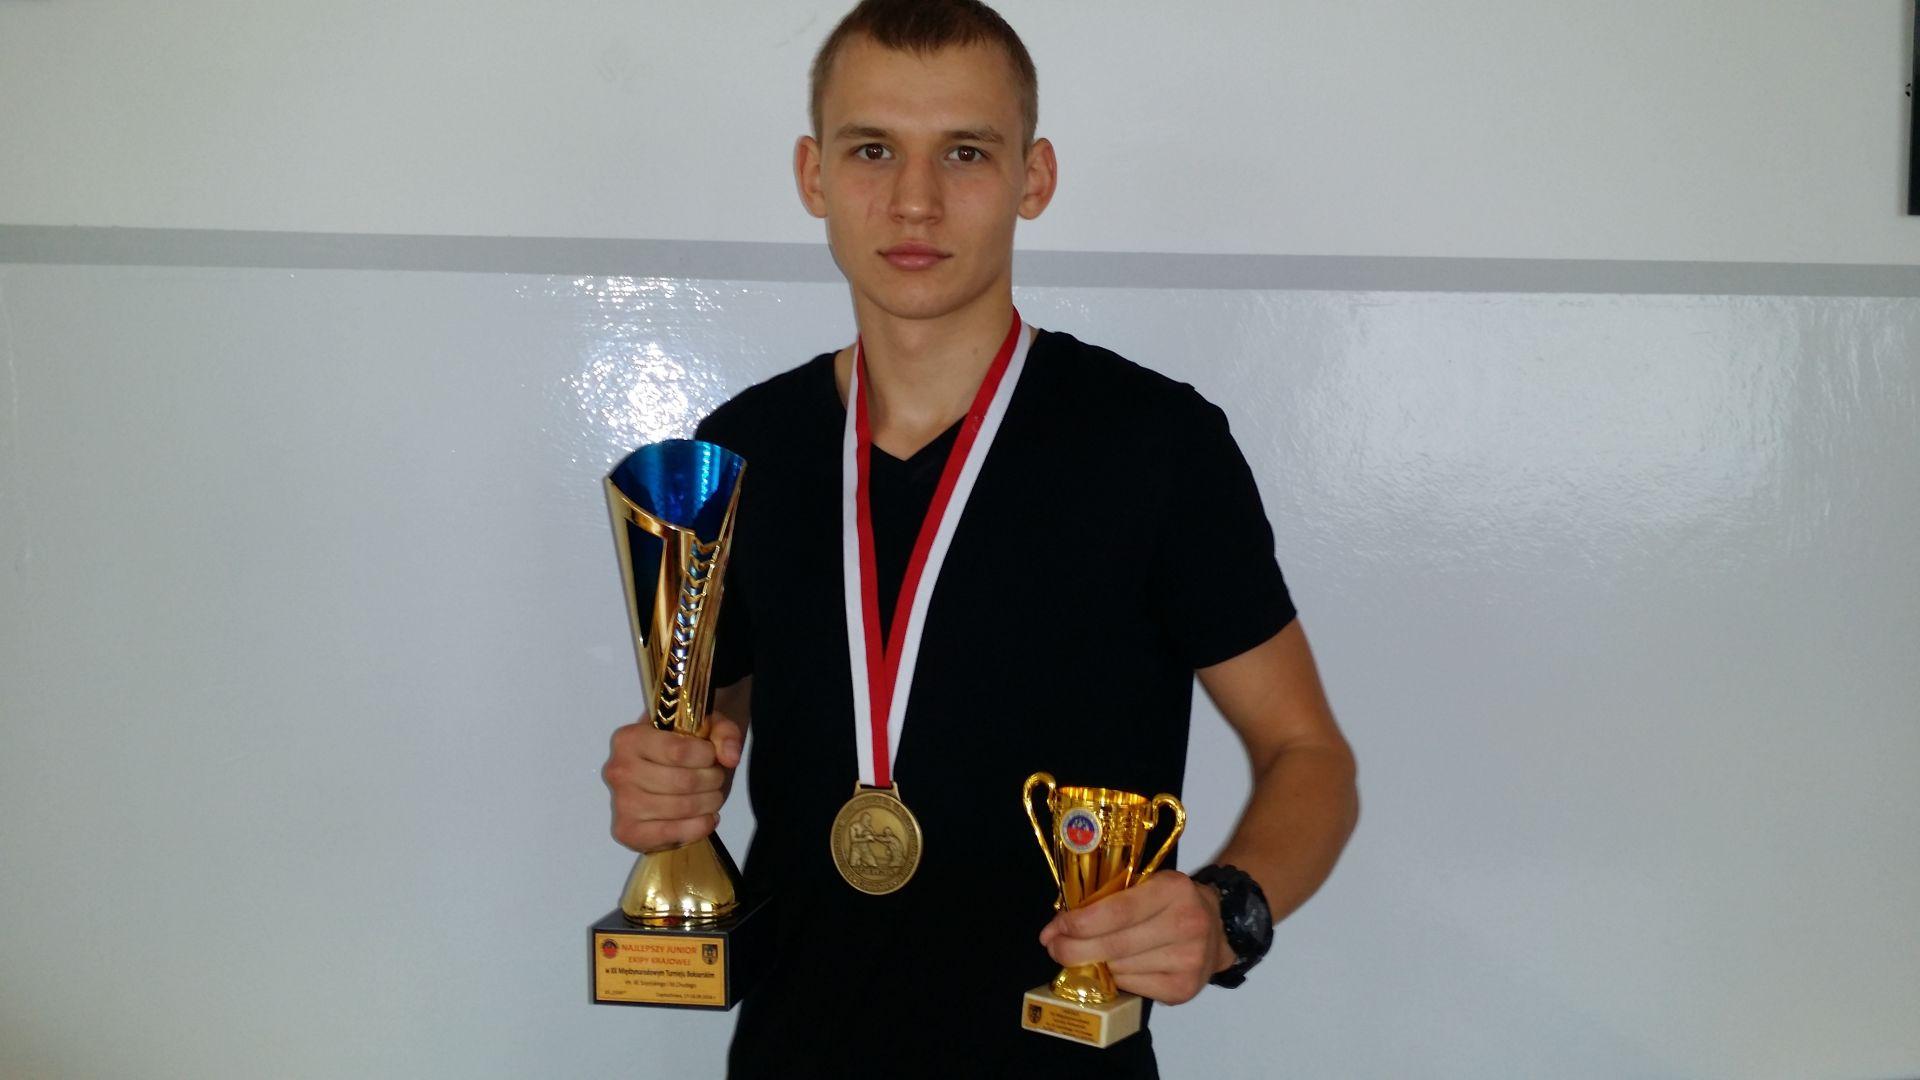 Konrad Białas